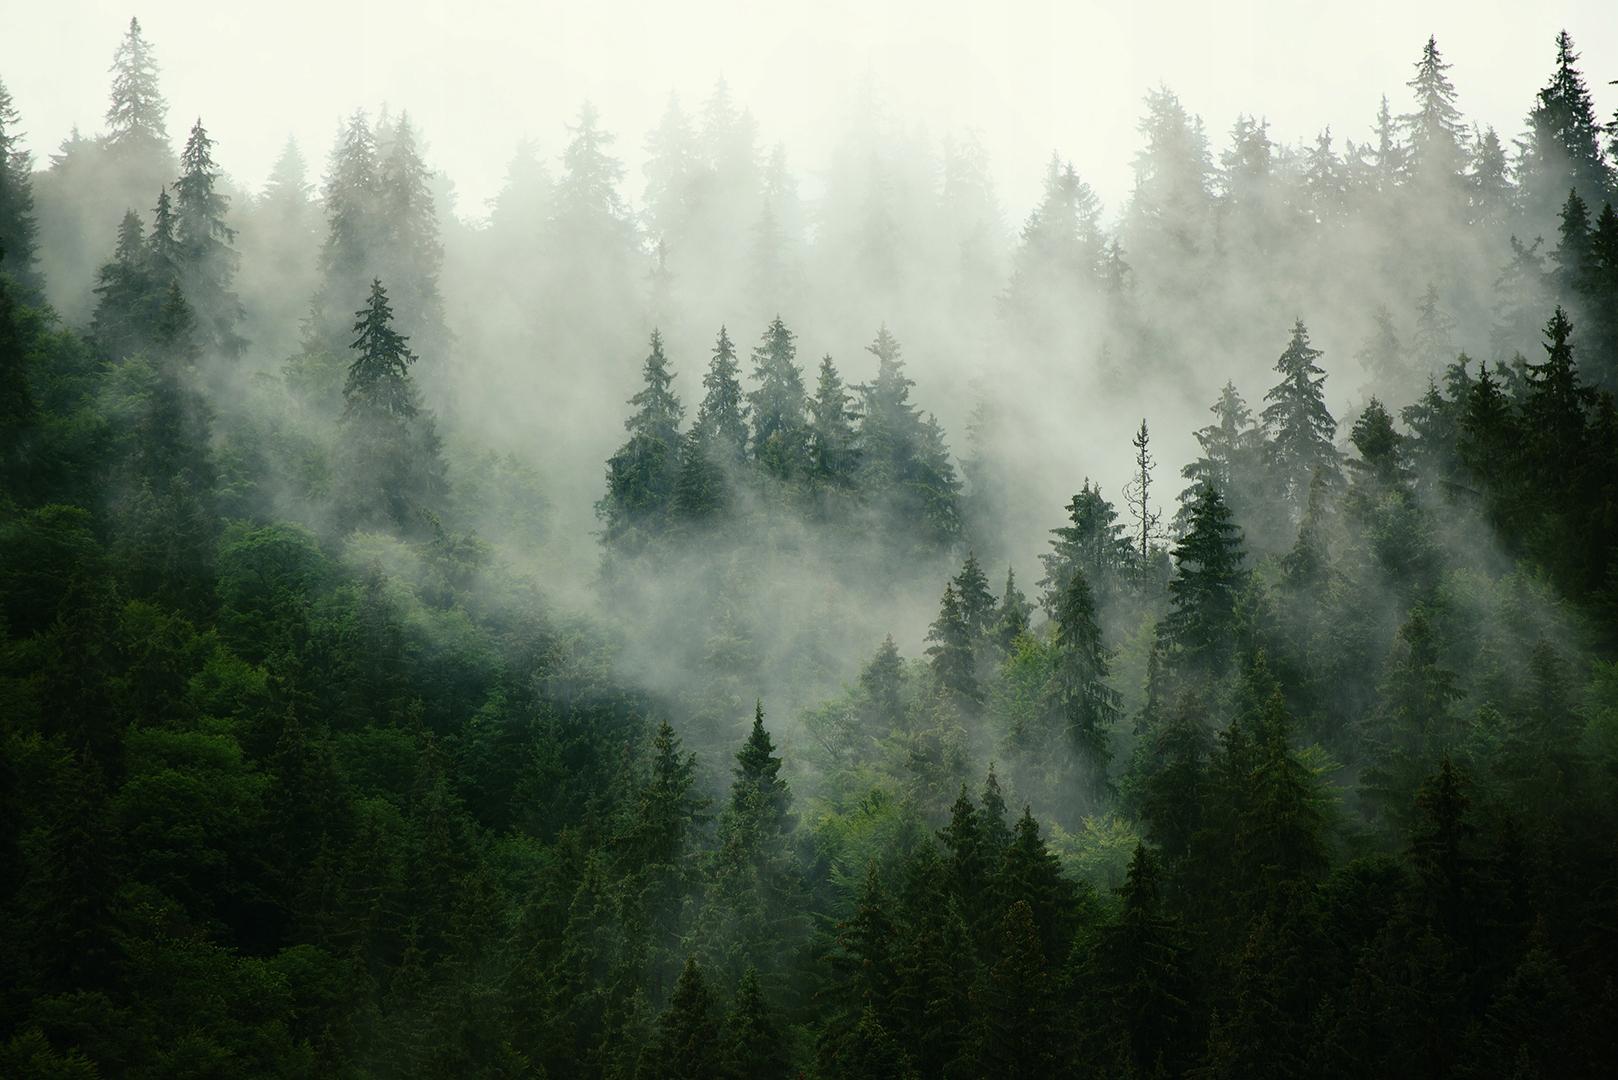 Fototapeta LAS WE MGLE drzewa mgła góry 294x260